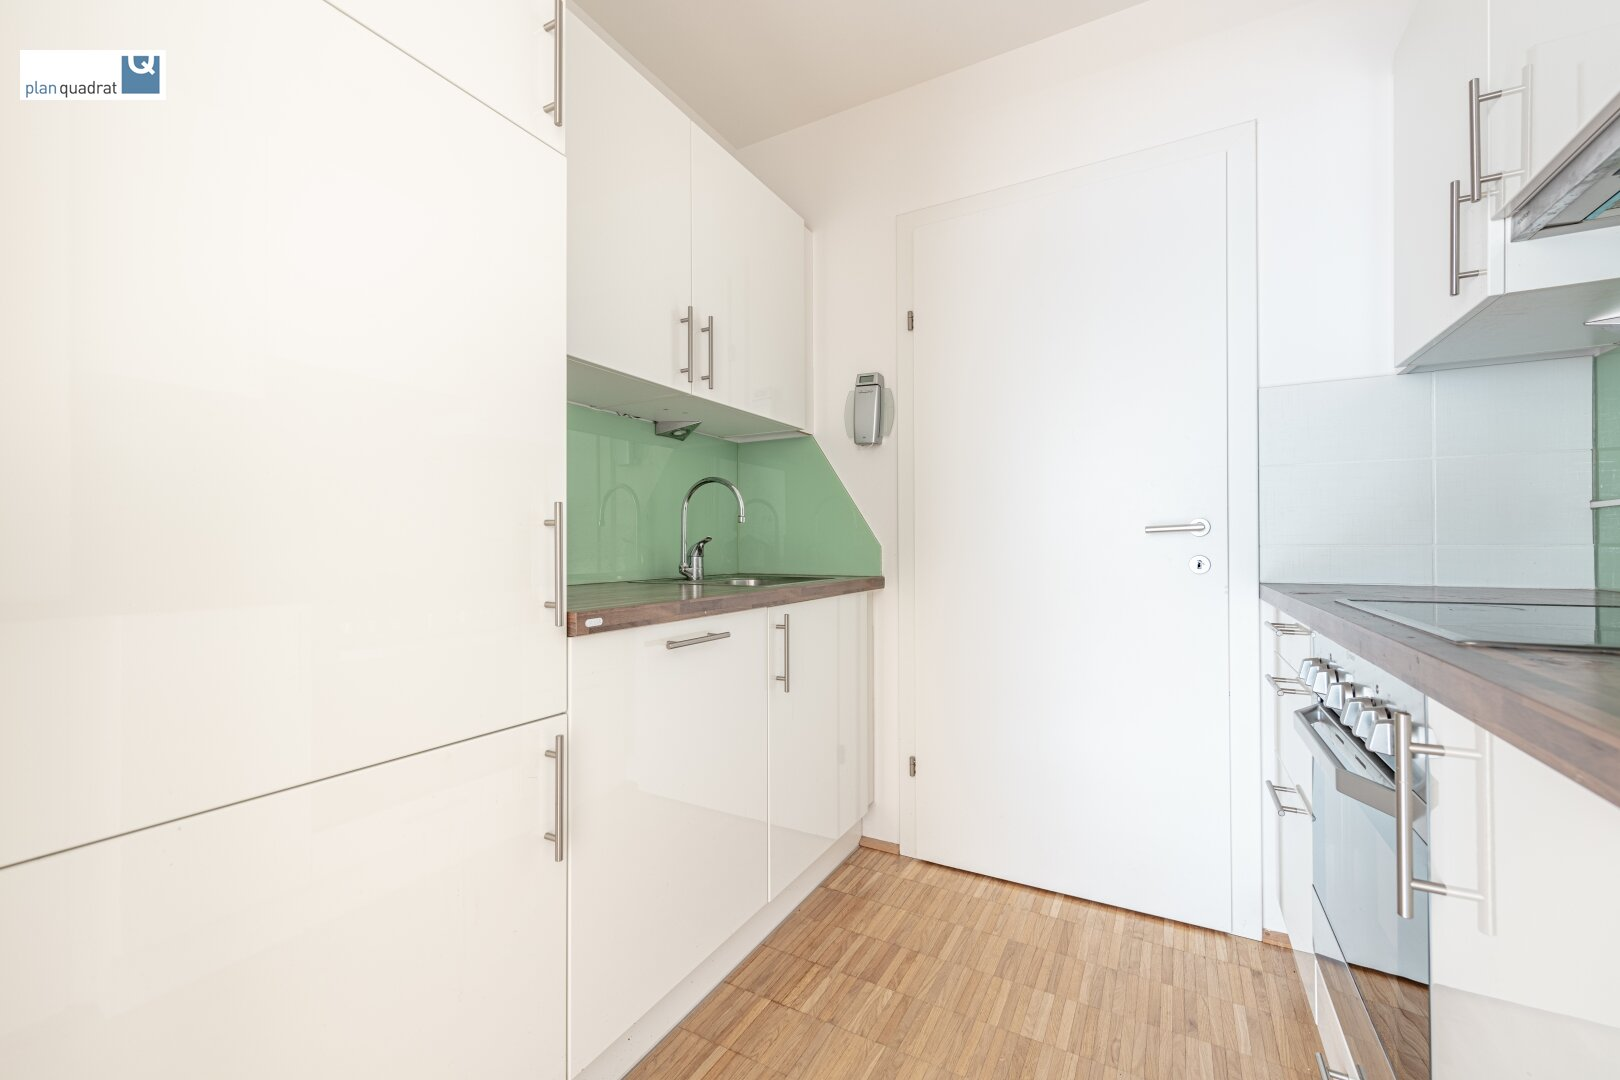 Küche (ca. 4,30 m² / inkl. E-Herd mit Ceranfeld, Dunstabzug, Geschirrspüler und Kühlschrank) mit Zugang zum Abstellraum